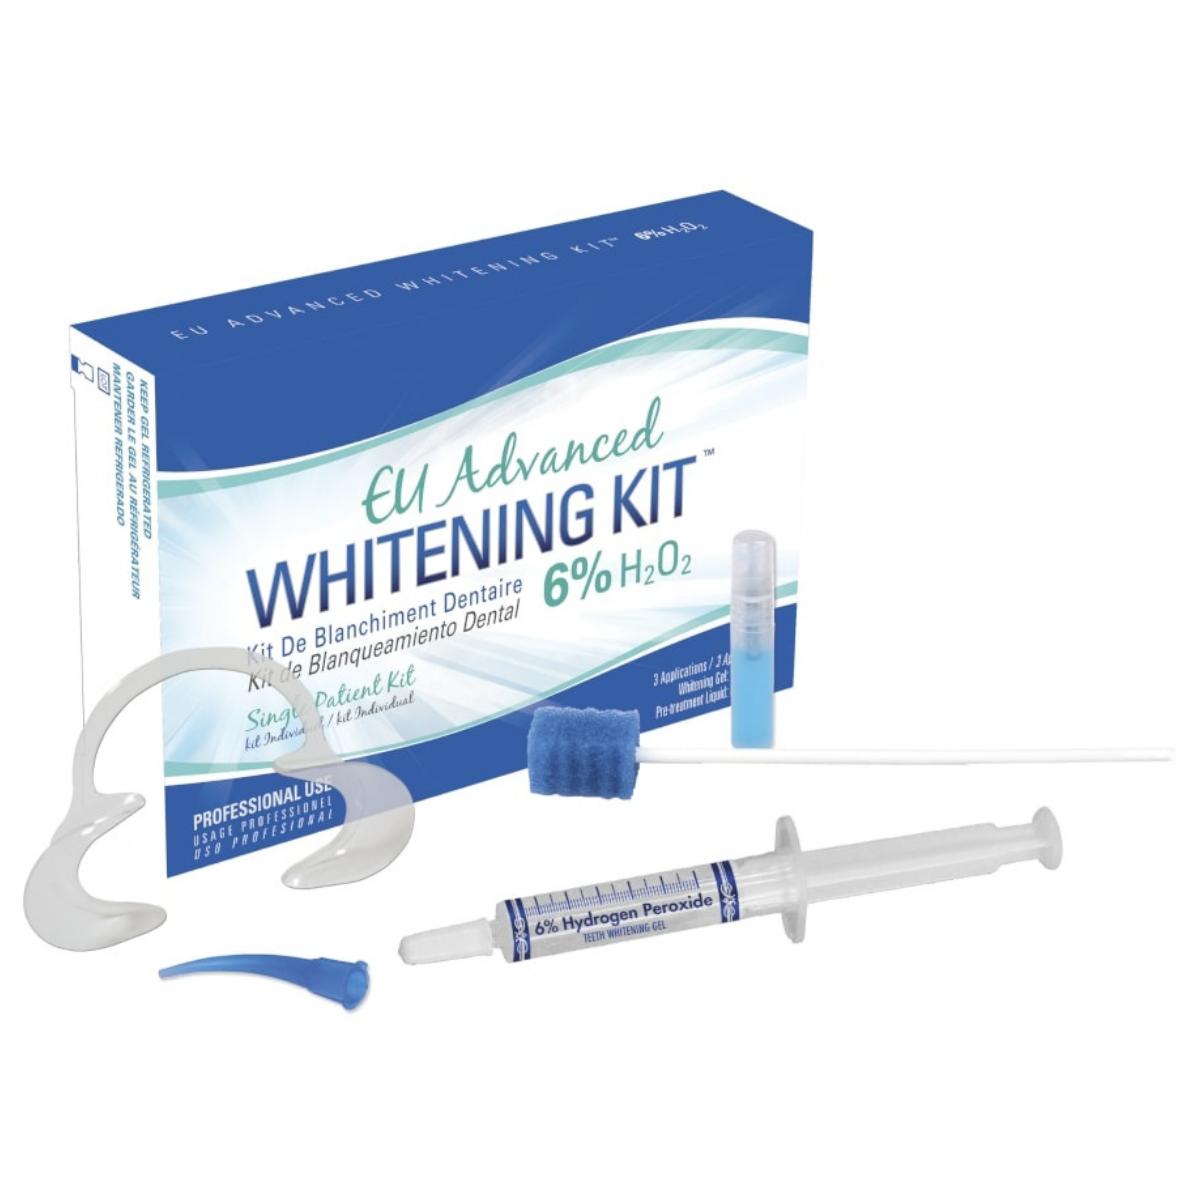 EU Advanced Whitening Kit 6 H2O2